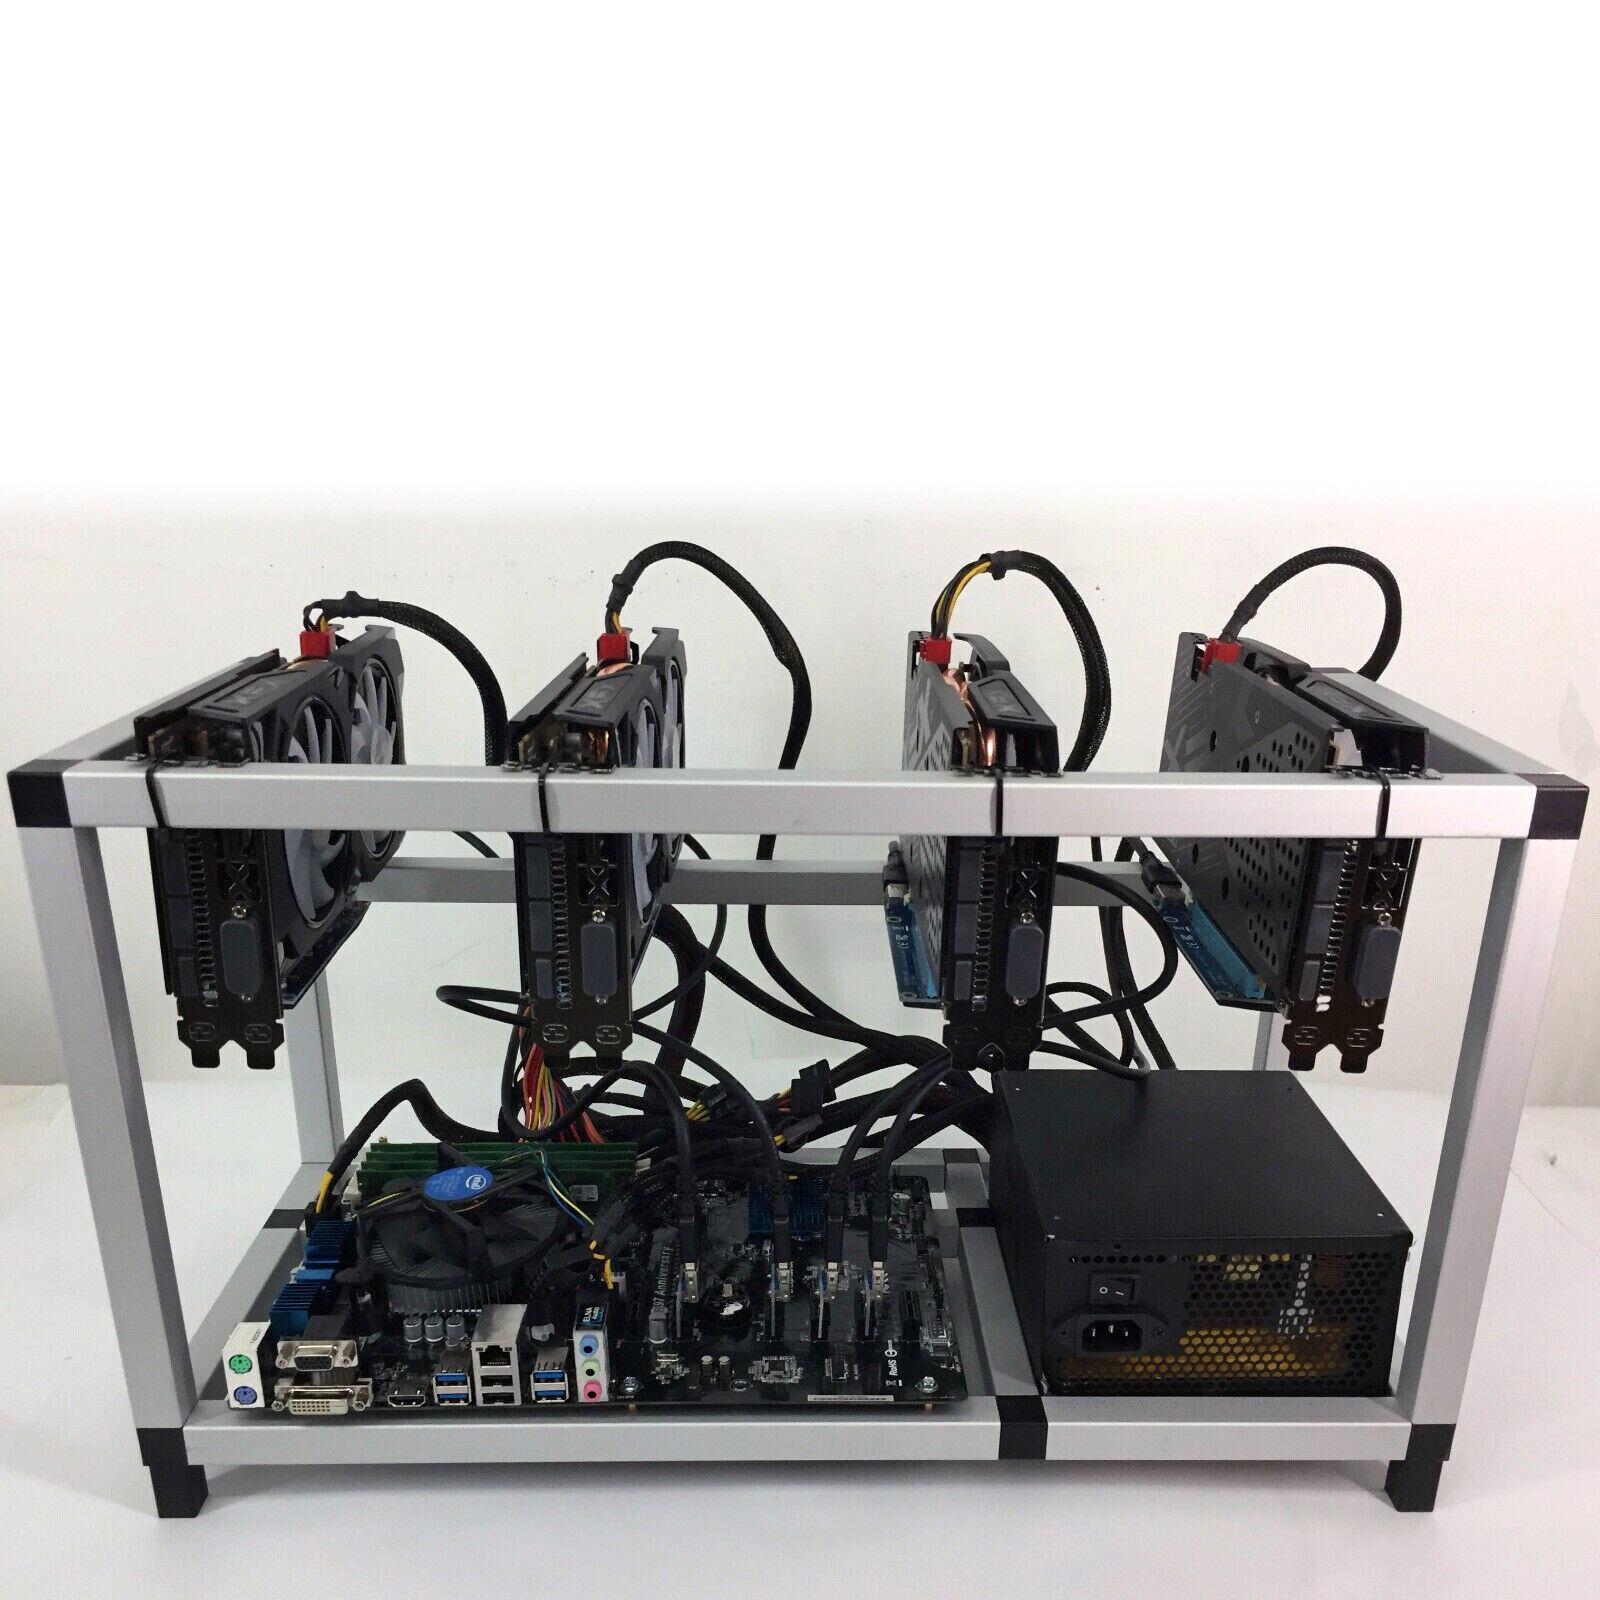 Details about Crypto Coin Mining Raven Grin Beam Ethereum Monero Bitcoin 4x  NVIDIA RTX 2080Ti